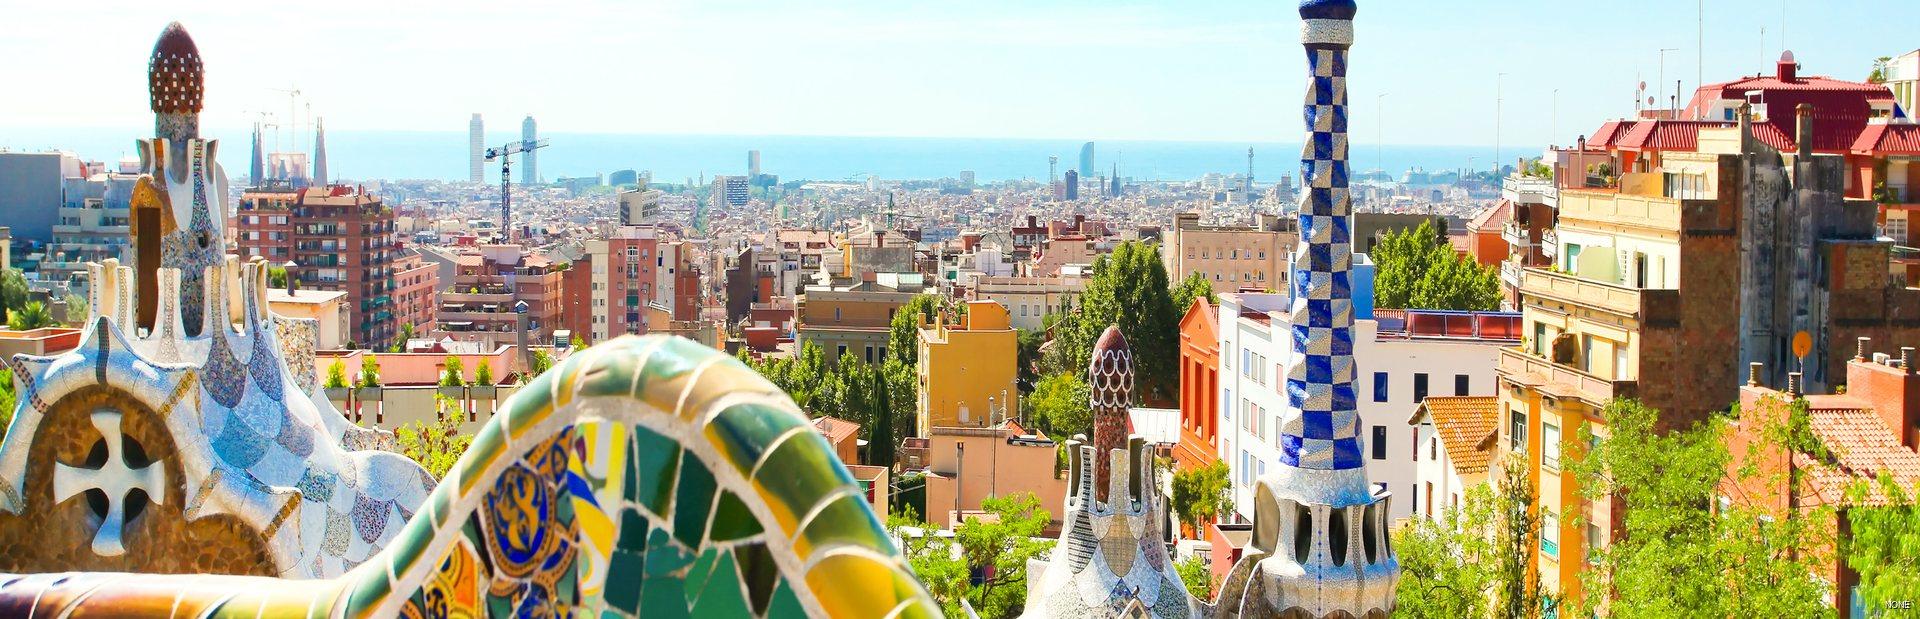 Barcelona climate photo